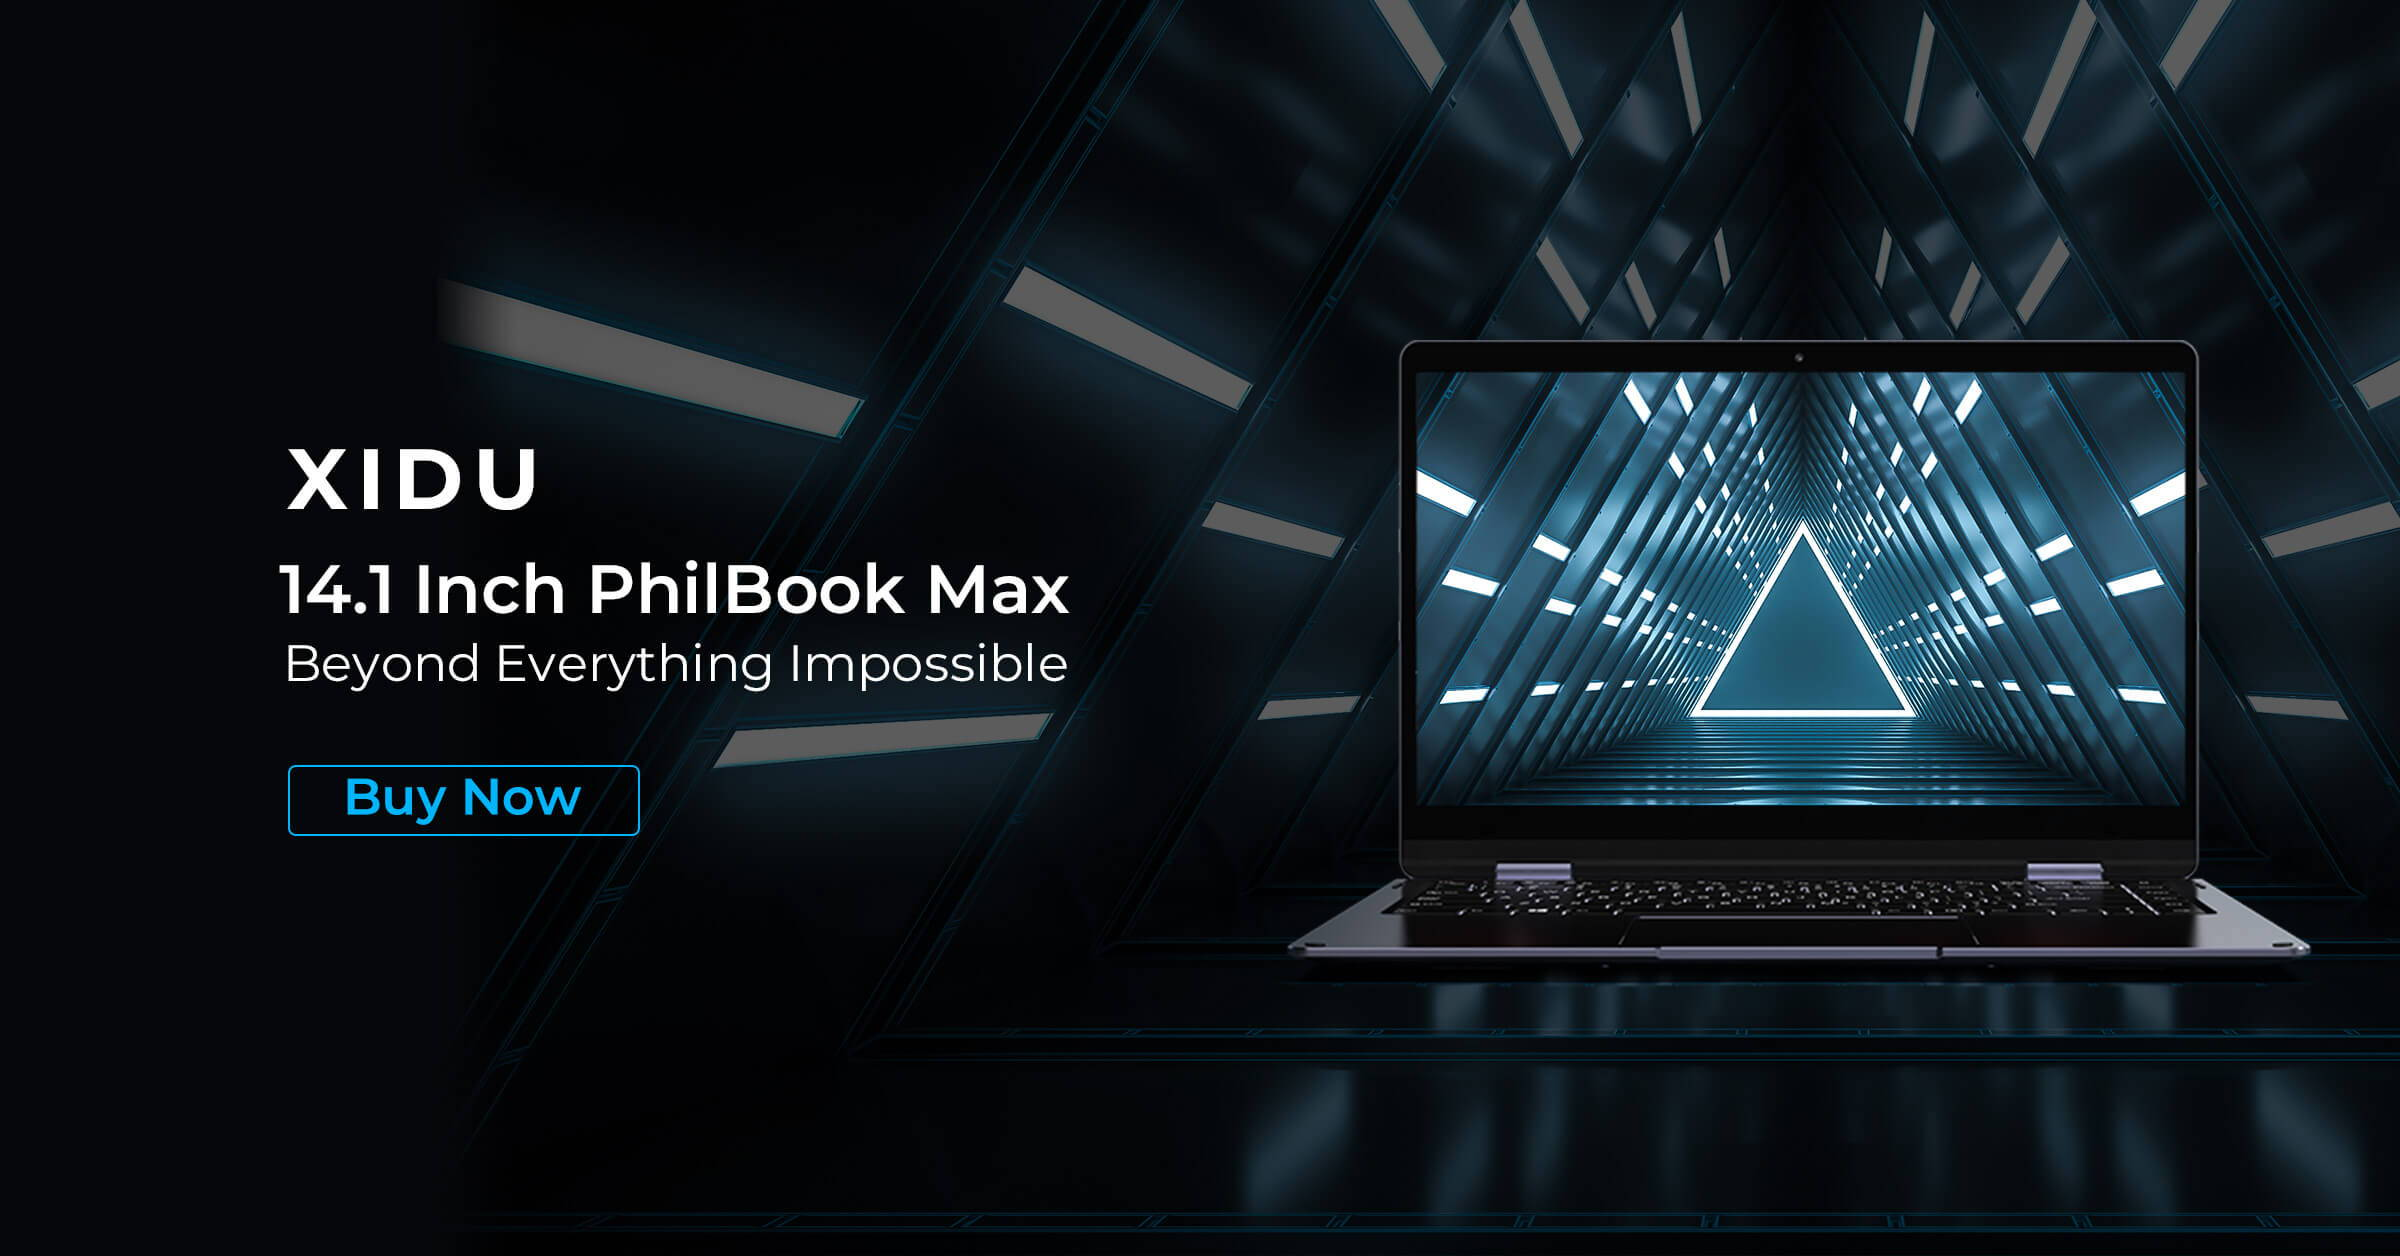 xidu-philbook-max2019